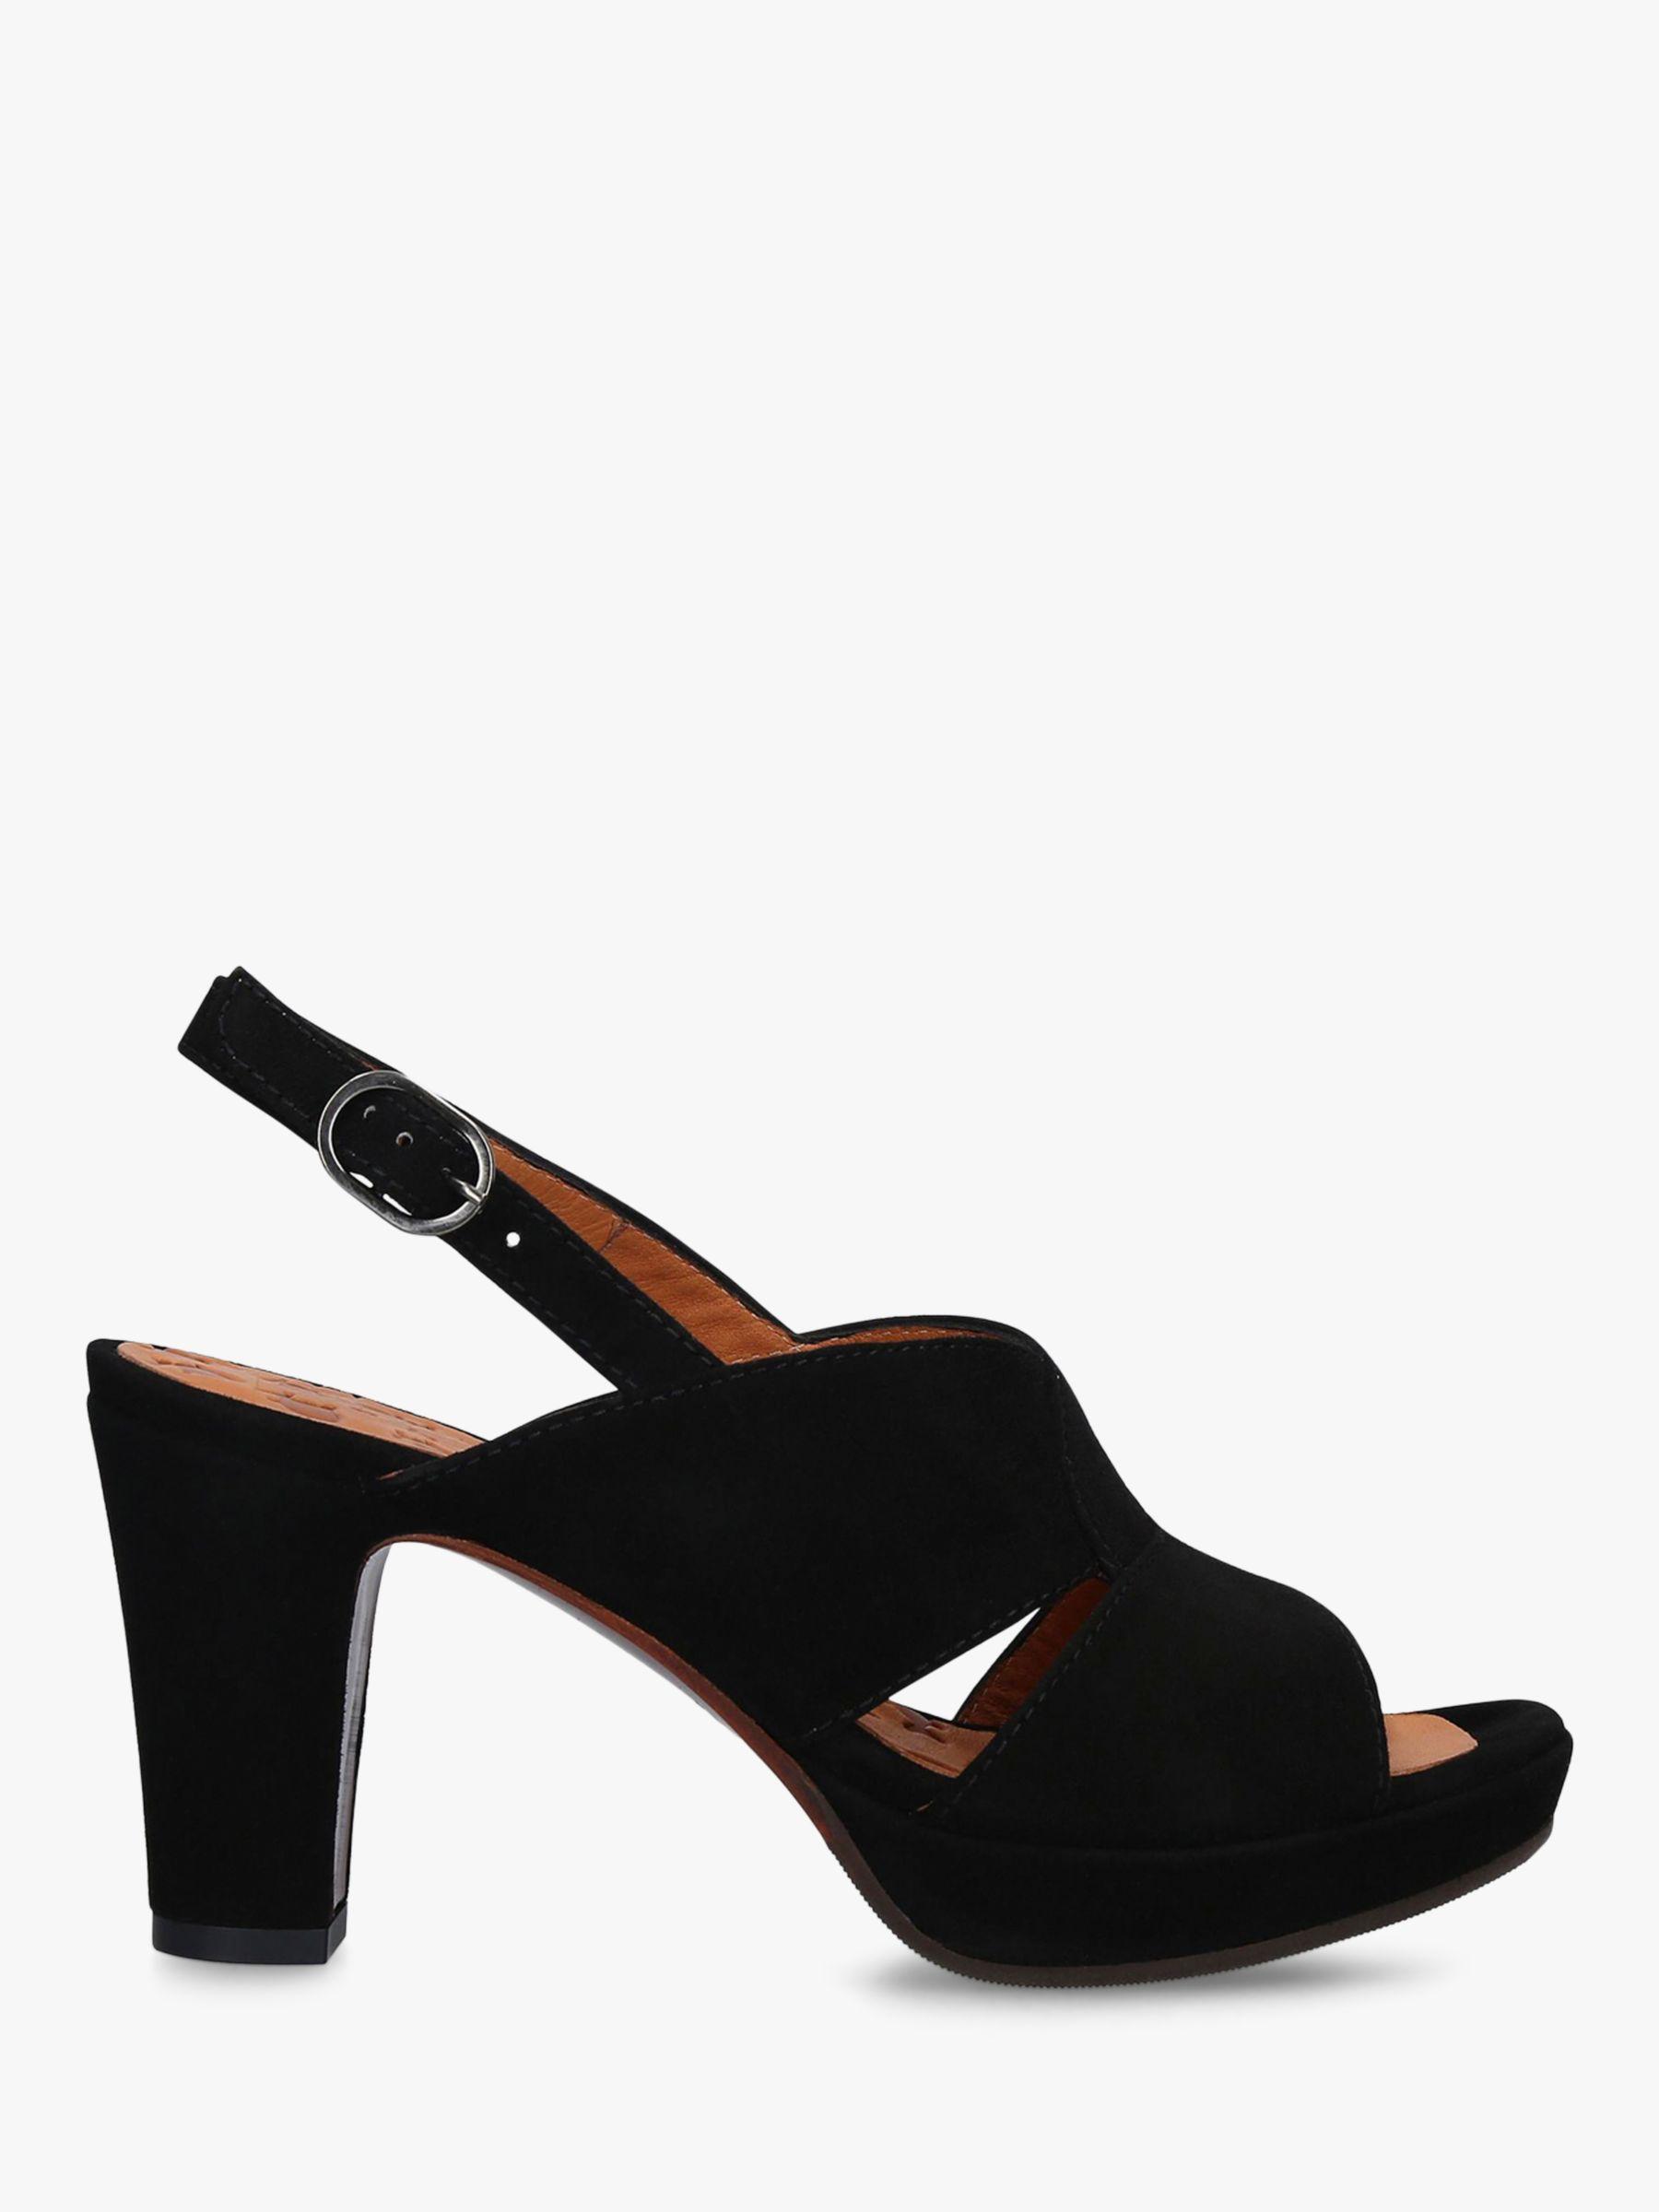 Chie Mihara Chie Mihara Eskol 36 Block Heel Platform Sandals, Black